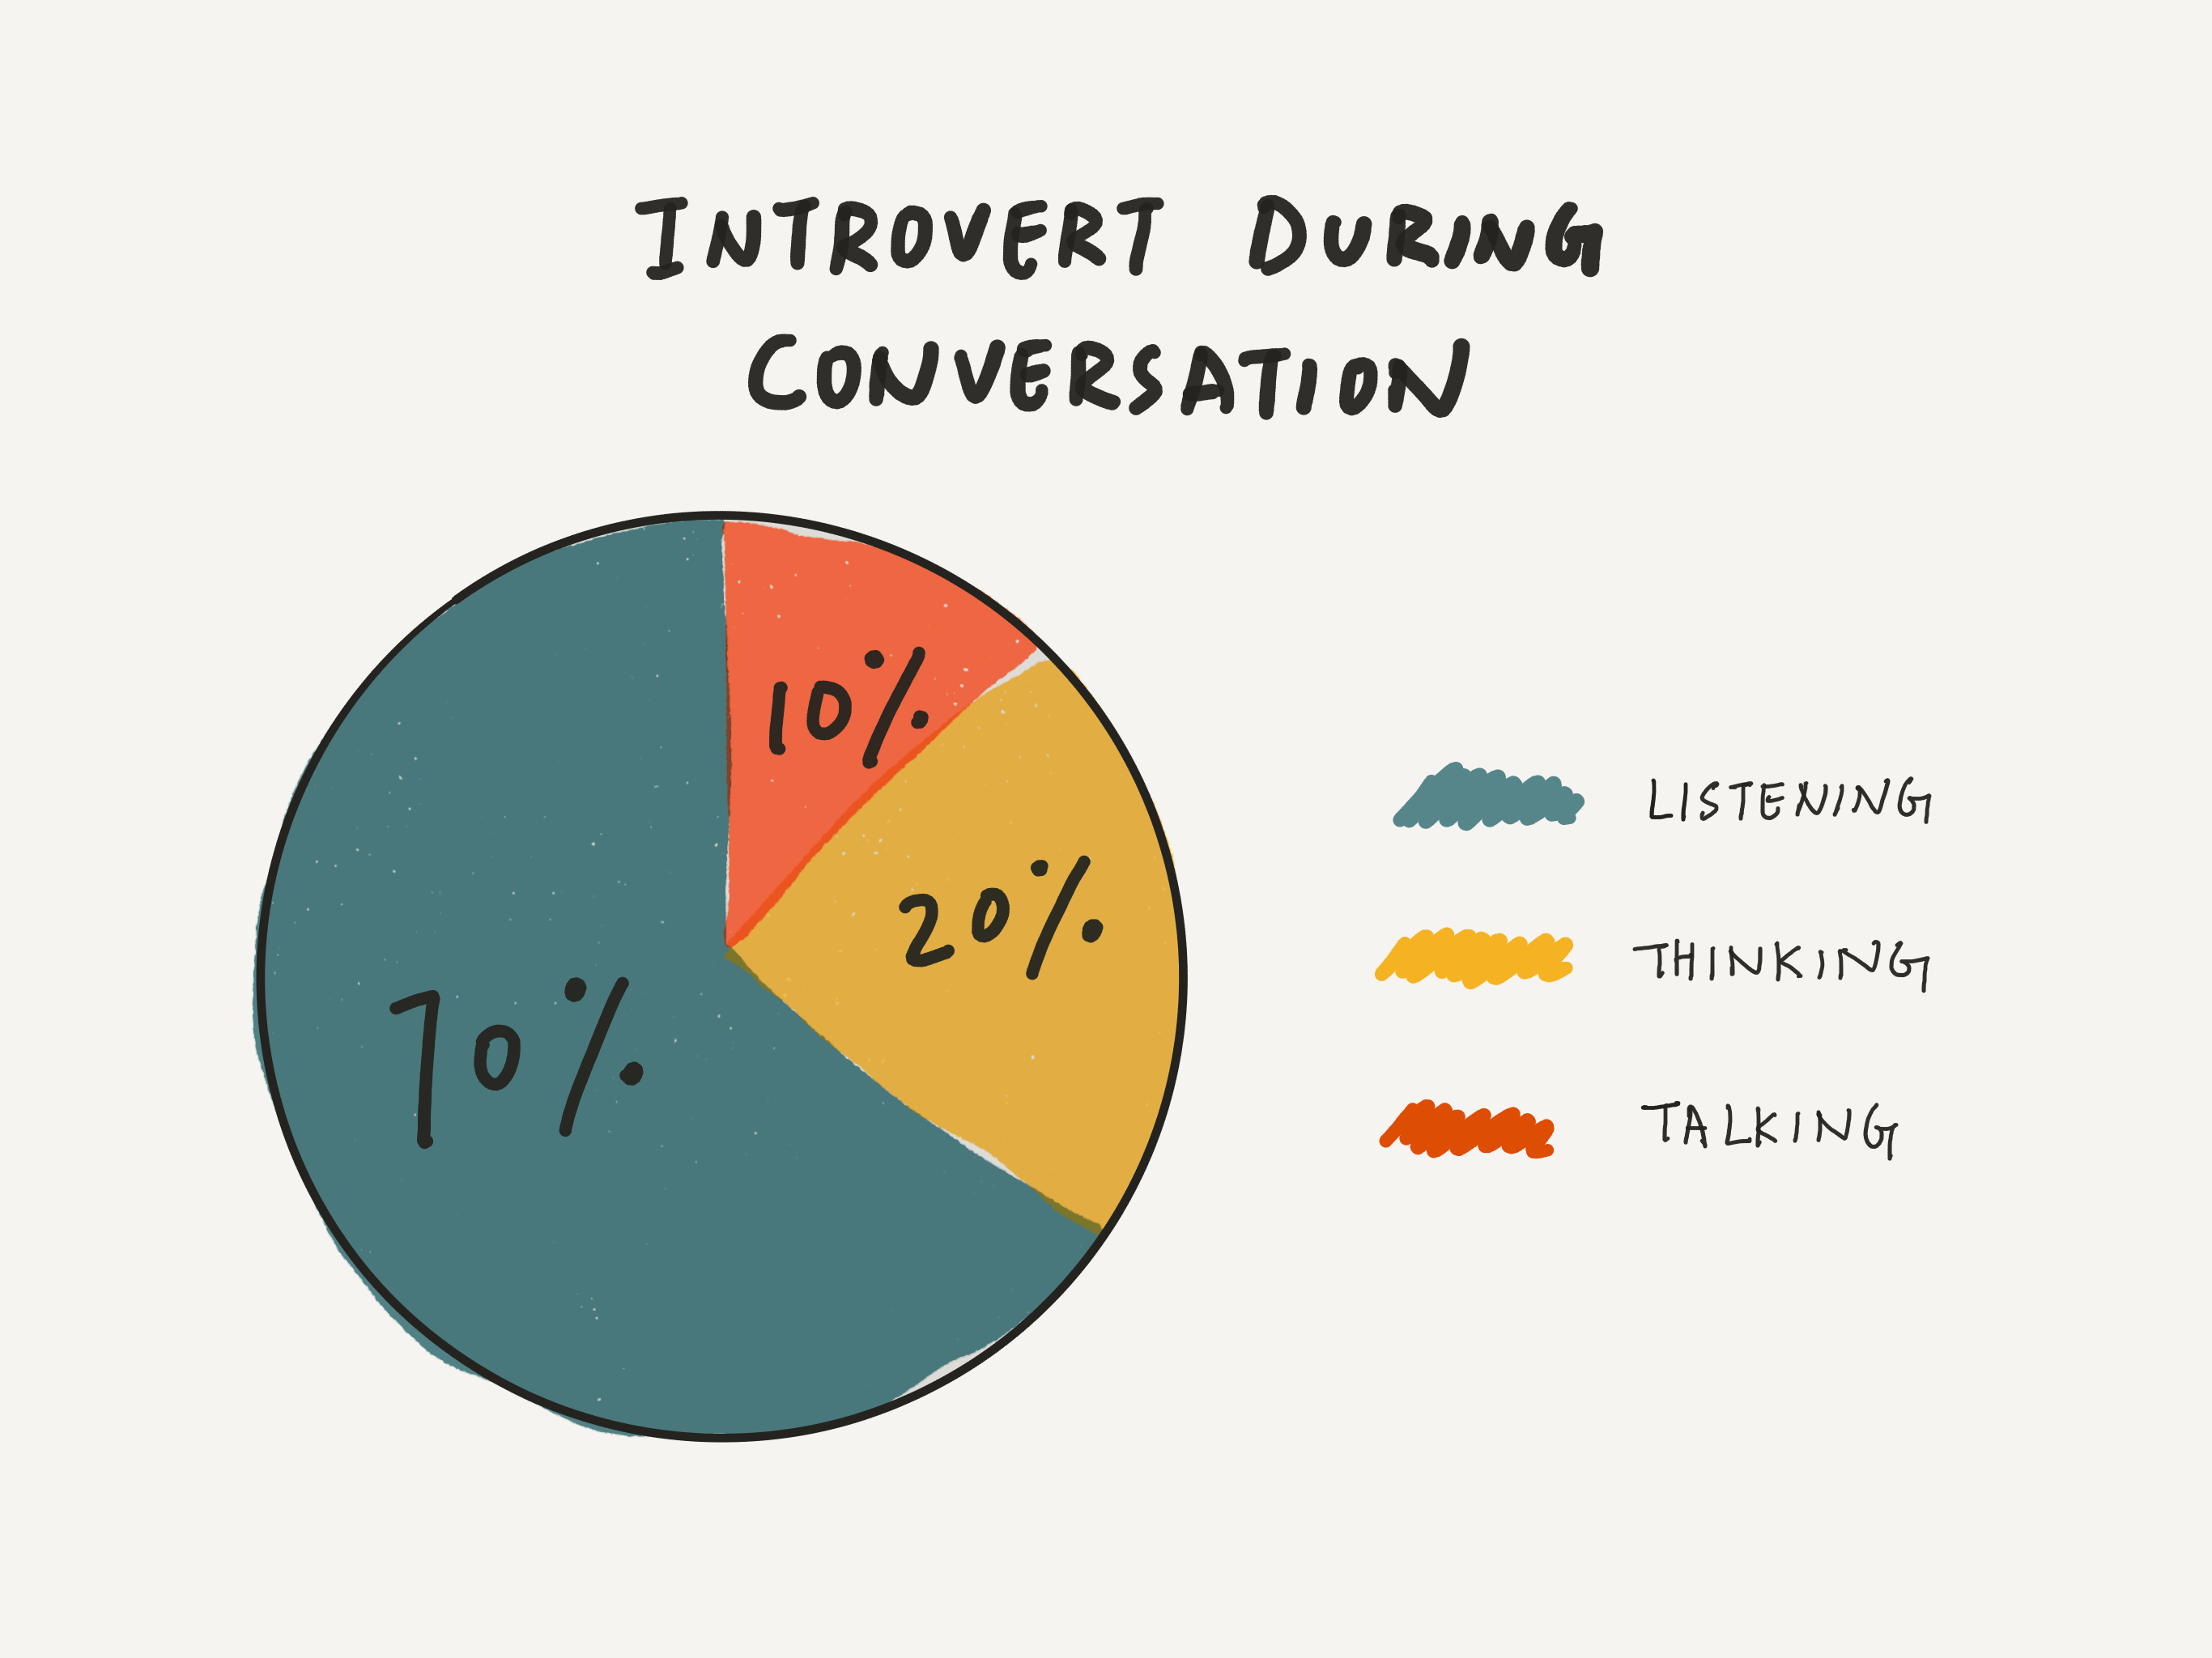 Introvert-traits